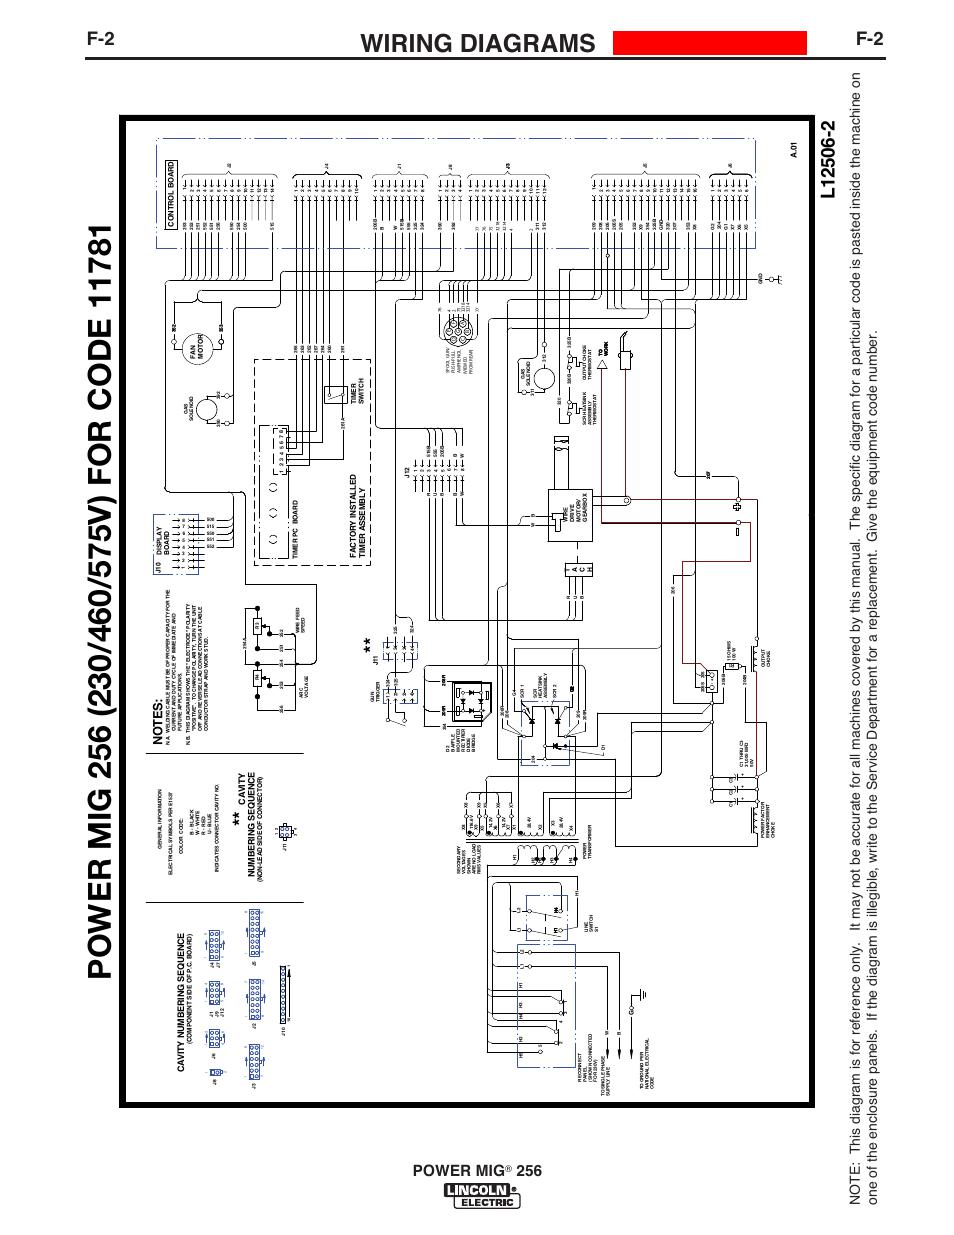 https://wireimage herokuapp com/post/boeing-wiring-diagram